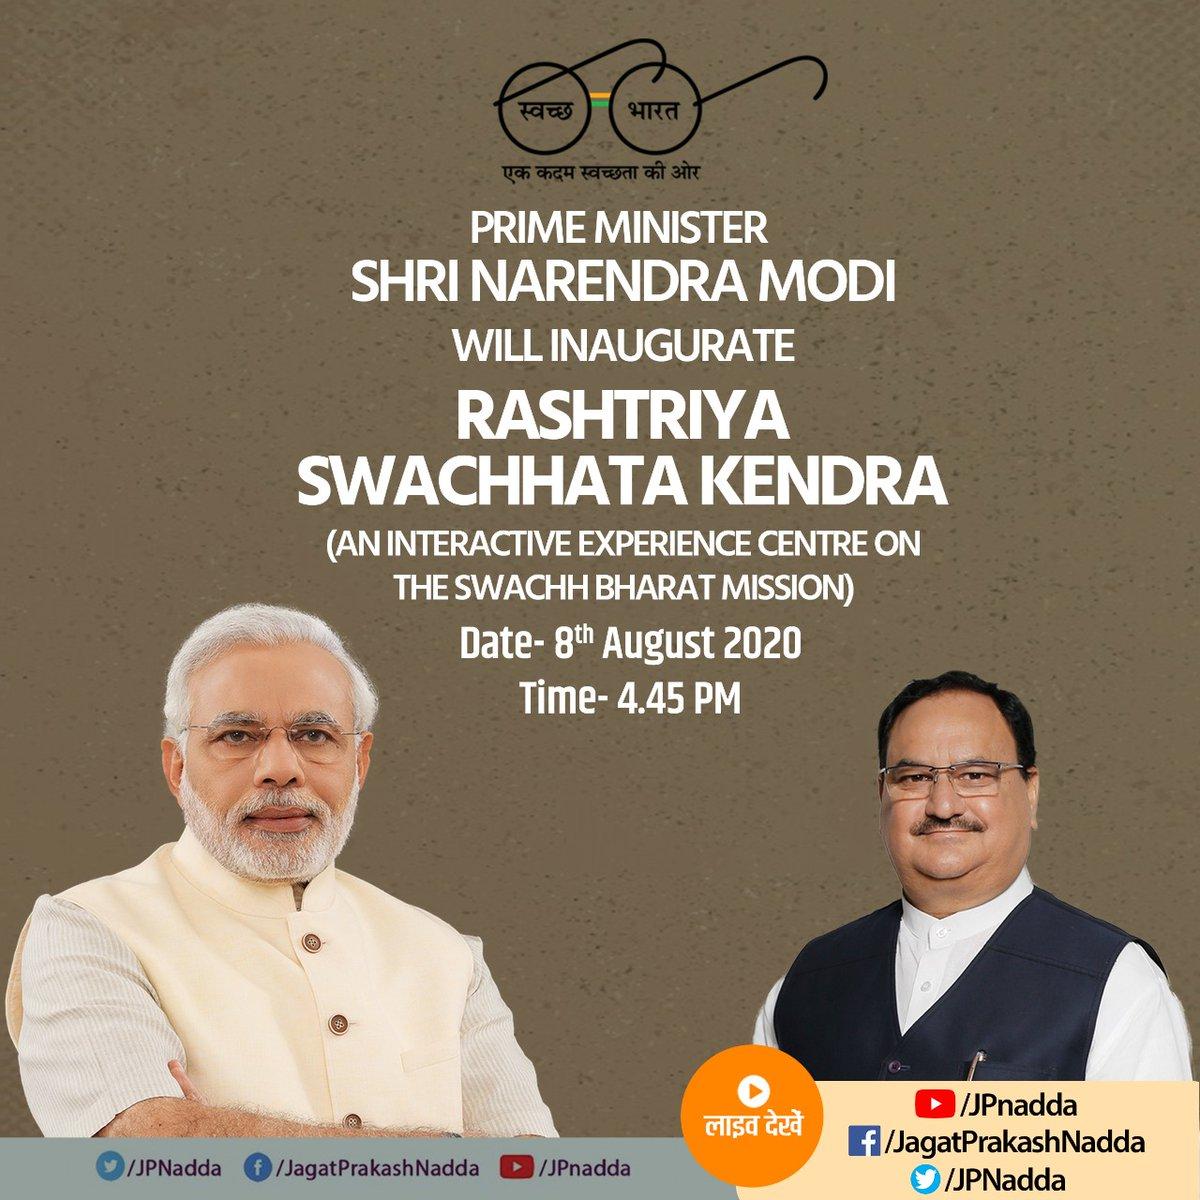 Hon Prime Minister Shri @narendramodi Ji will inaugurate Rashtriya Swachhata Kendra (an interactive experience centre on the Swachh Bharat Mission) at 4:45 PM today. https://t.co/Y6zznJ36Wv